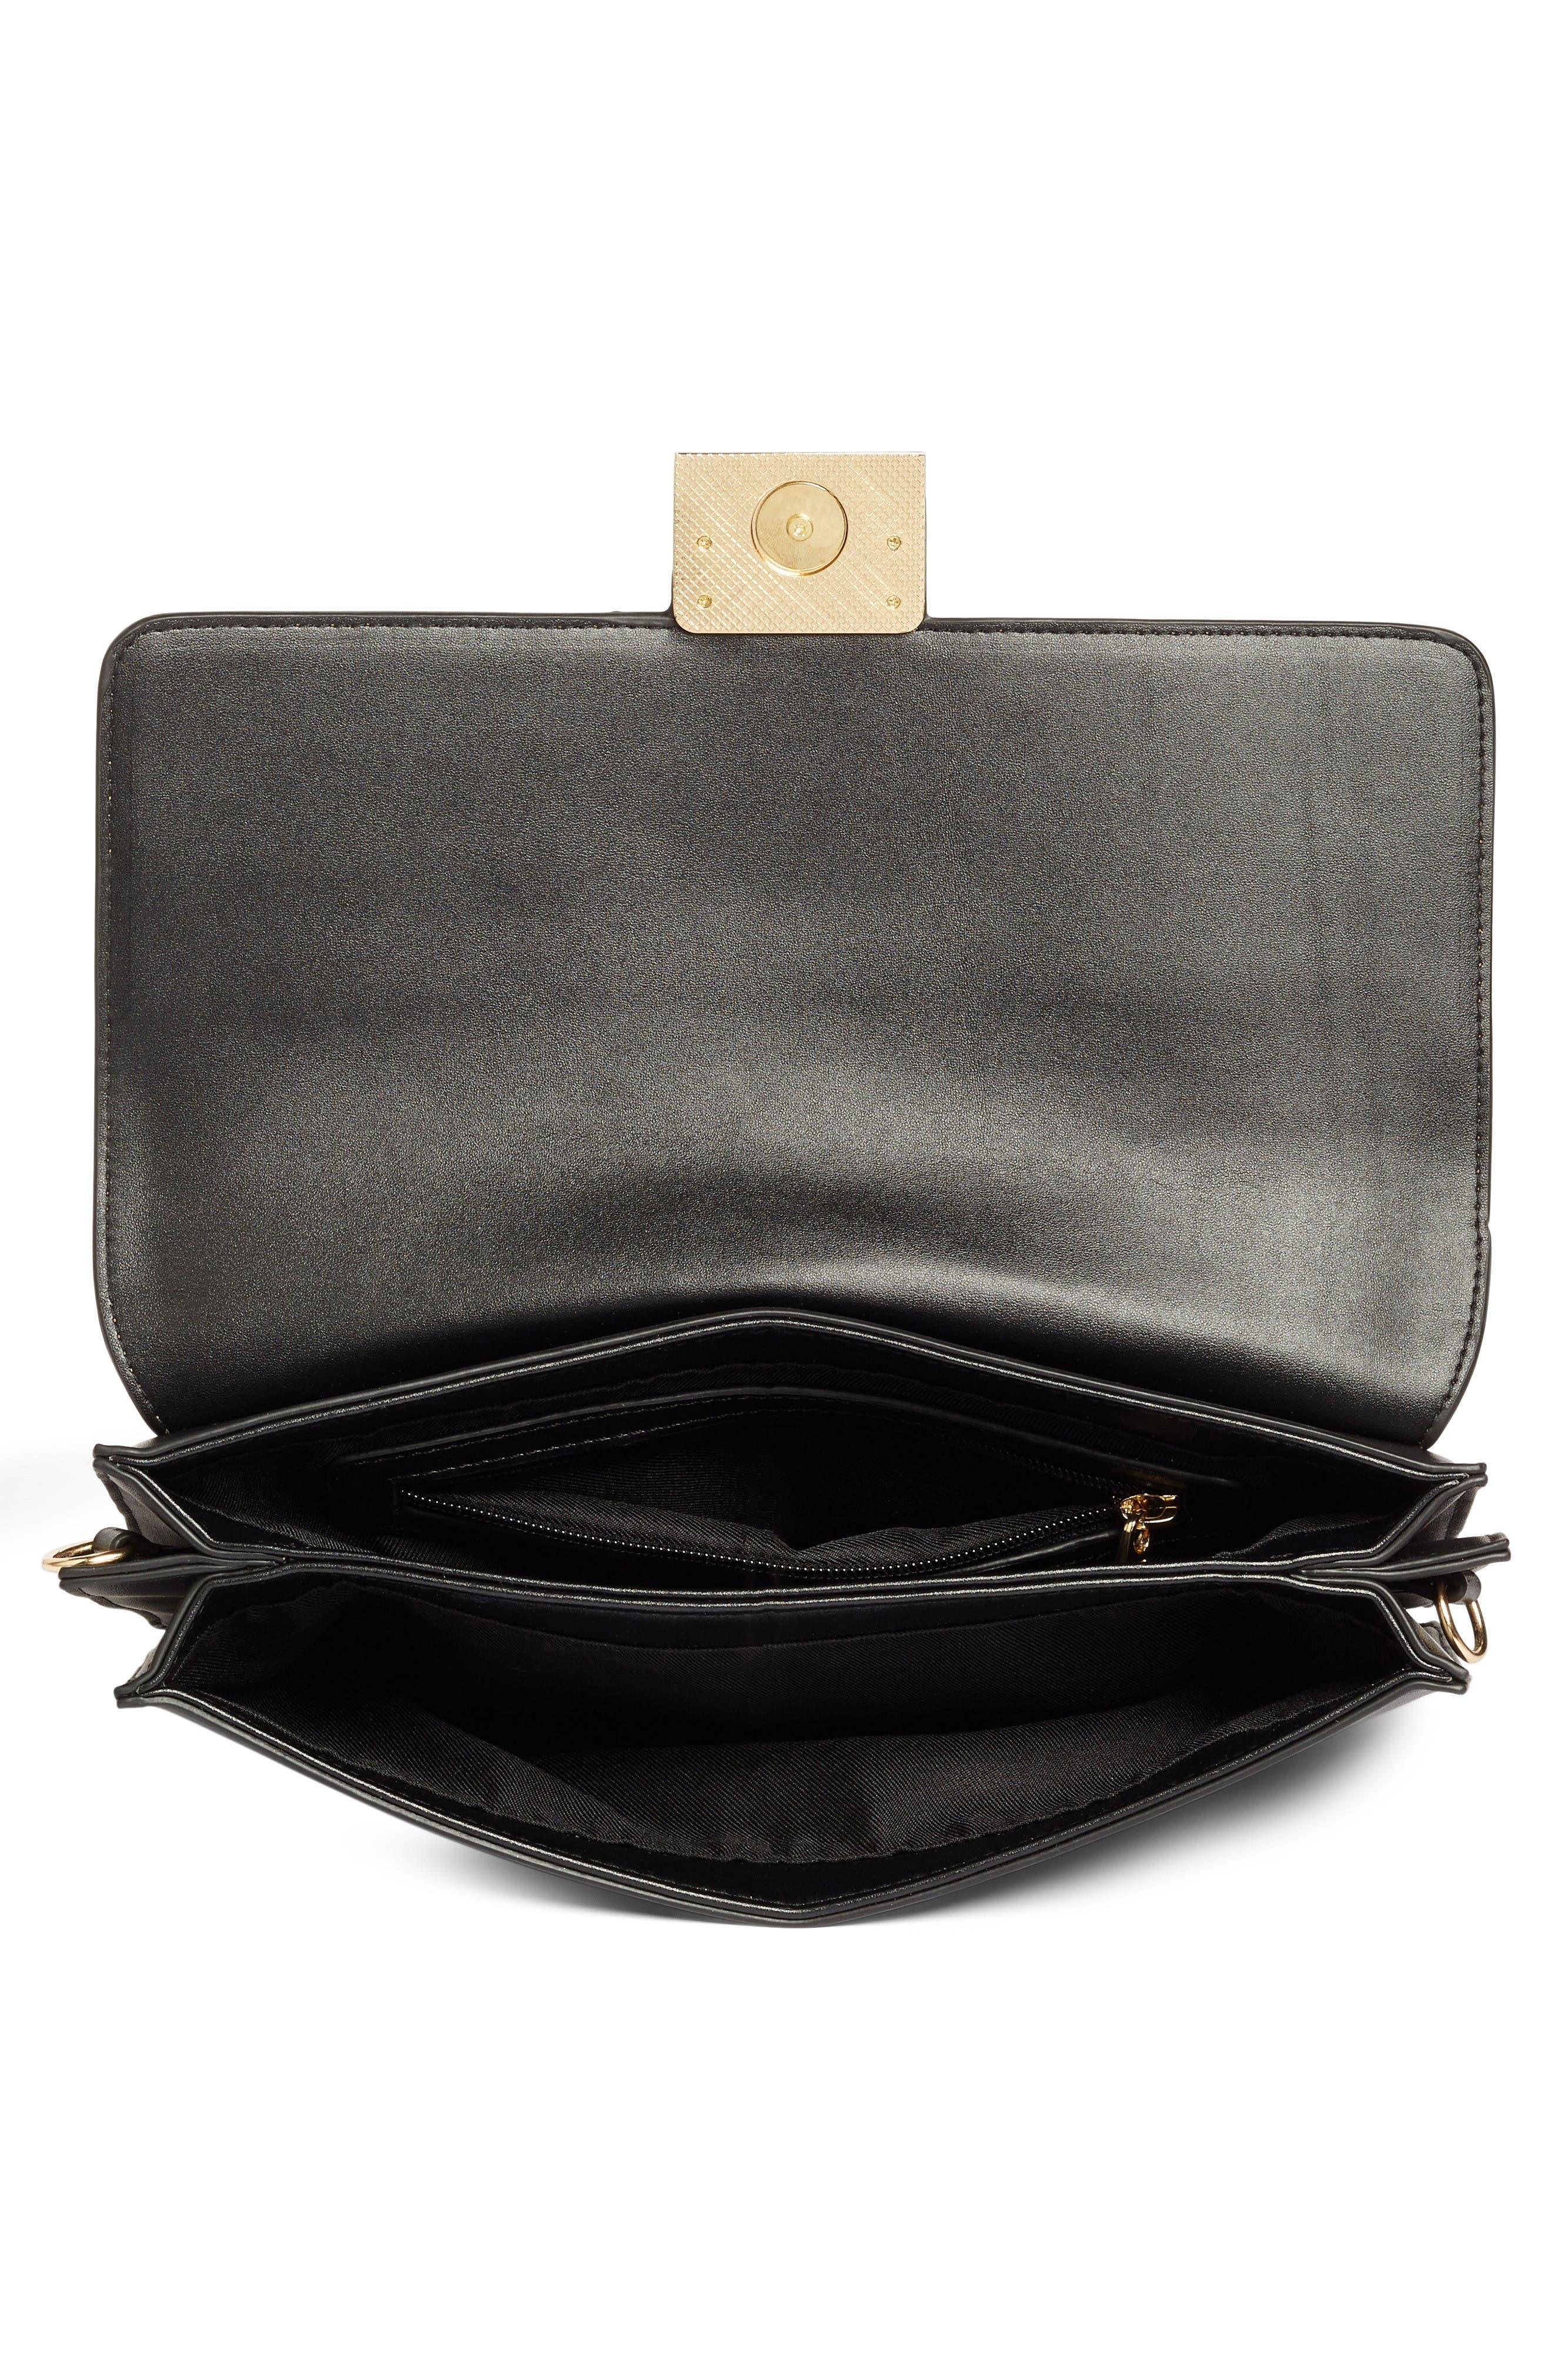 Leighton Colorblock Faux Leather Crossbody Bag,                             Alternate thumbnail 4, color,                             Black/Cognac